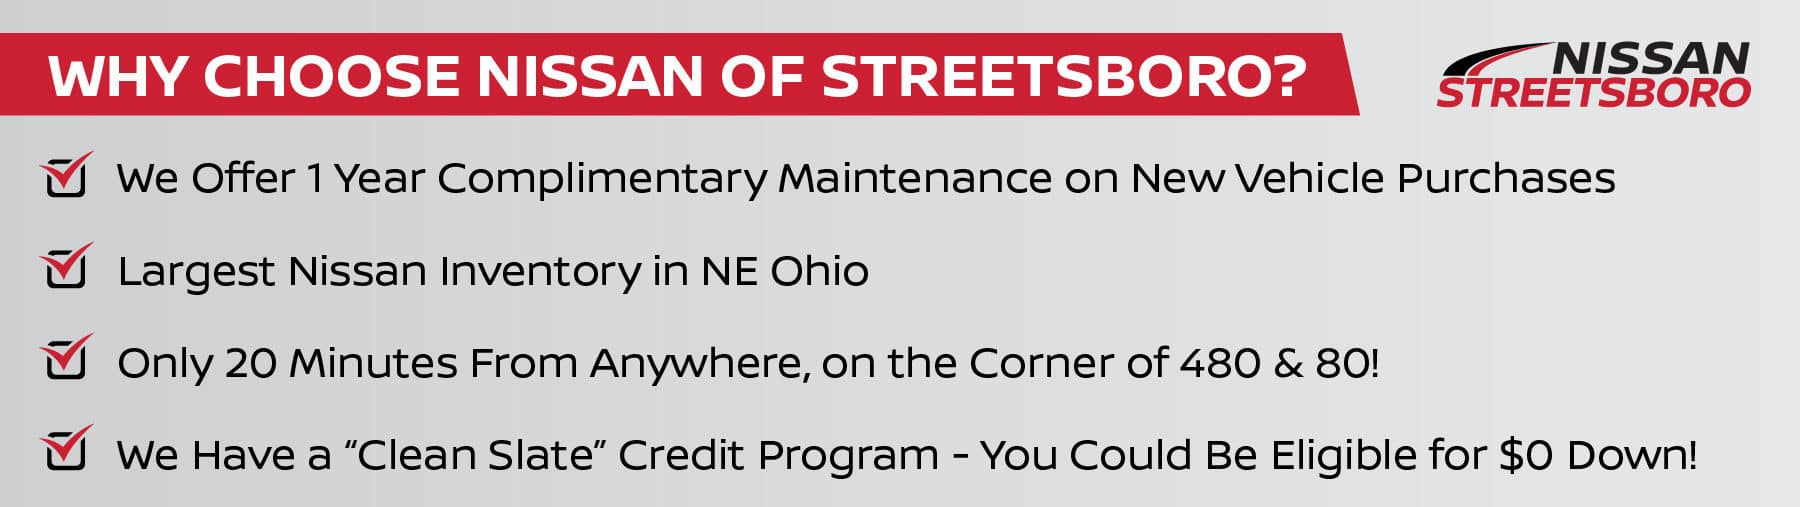 Choose Nissan of Streetsboro